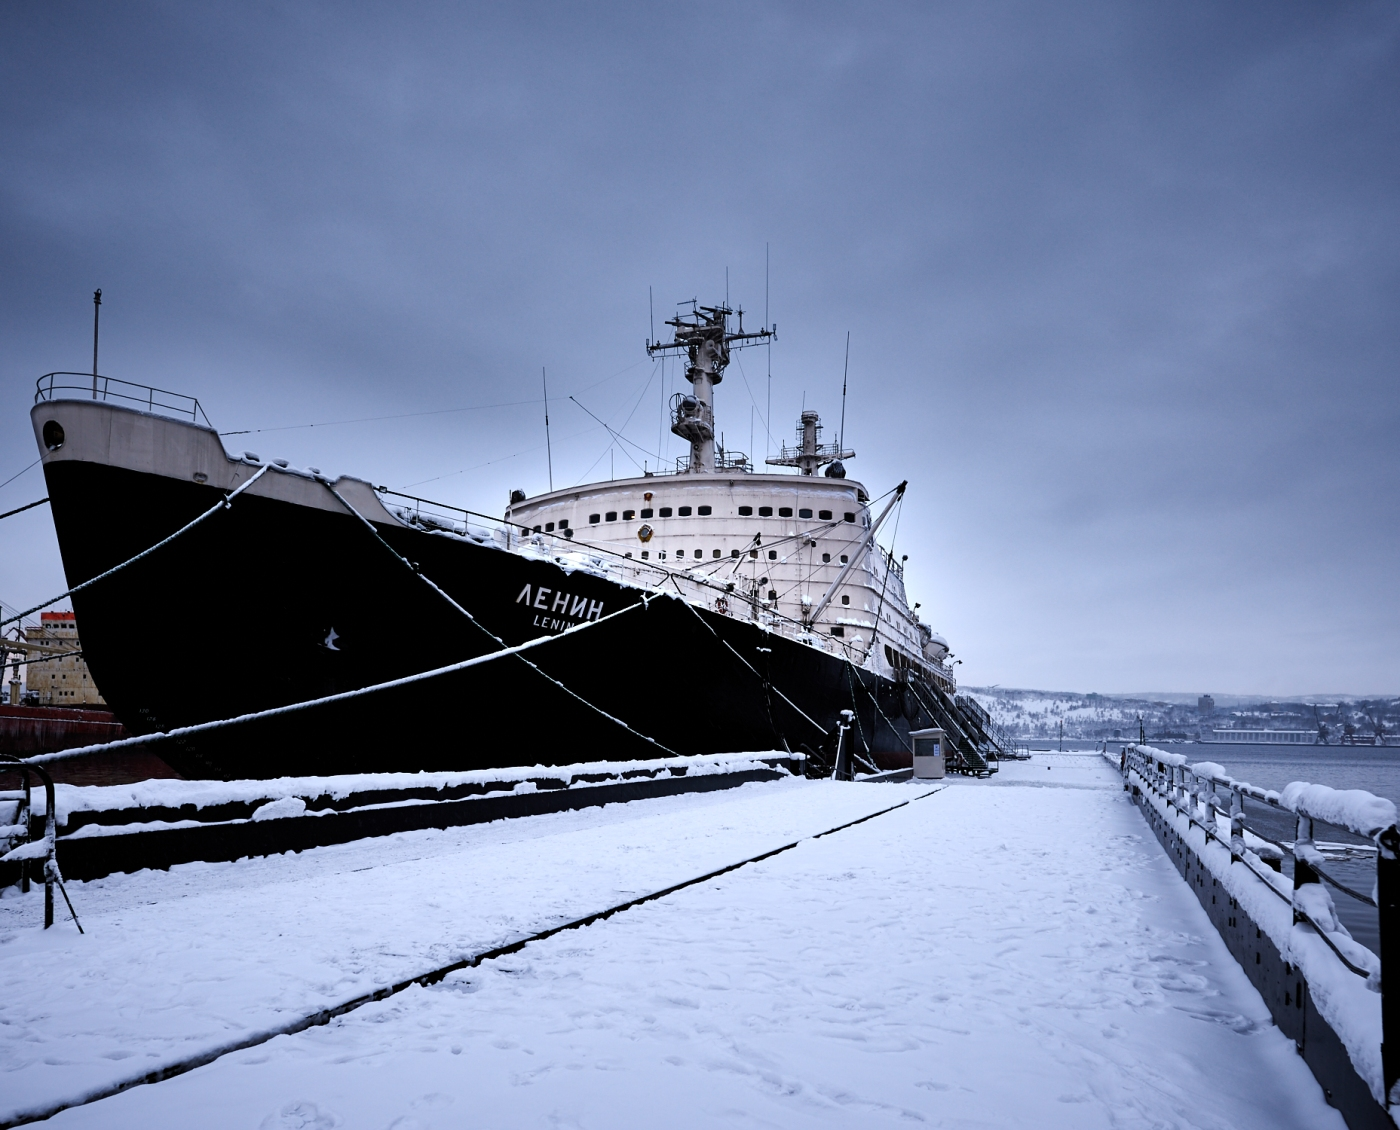 Lenin - the first nuclear propulsion ship